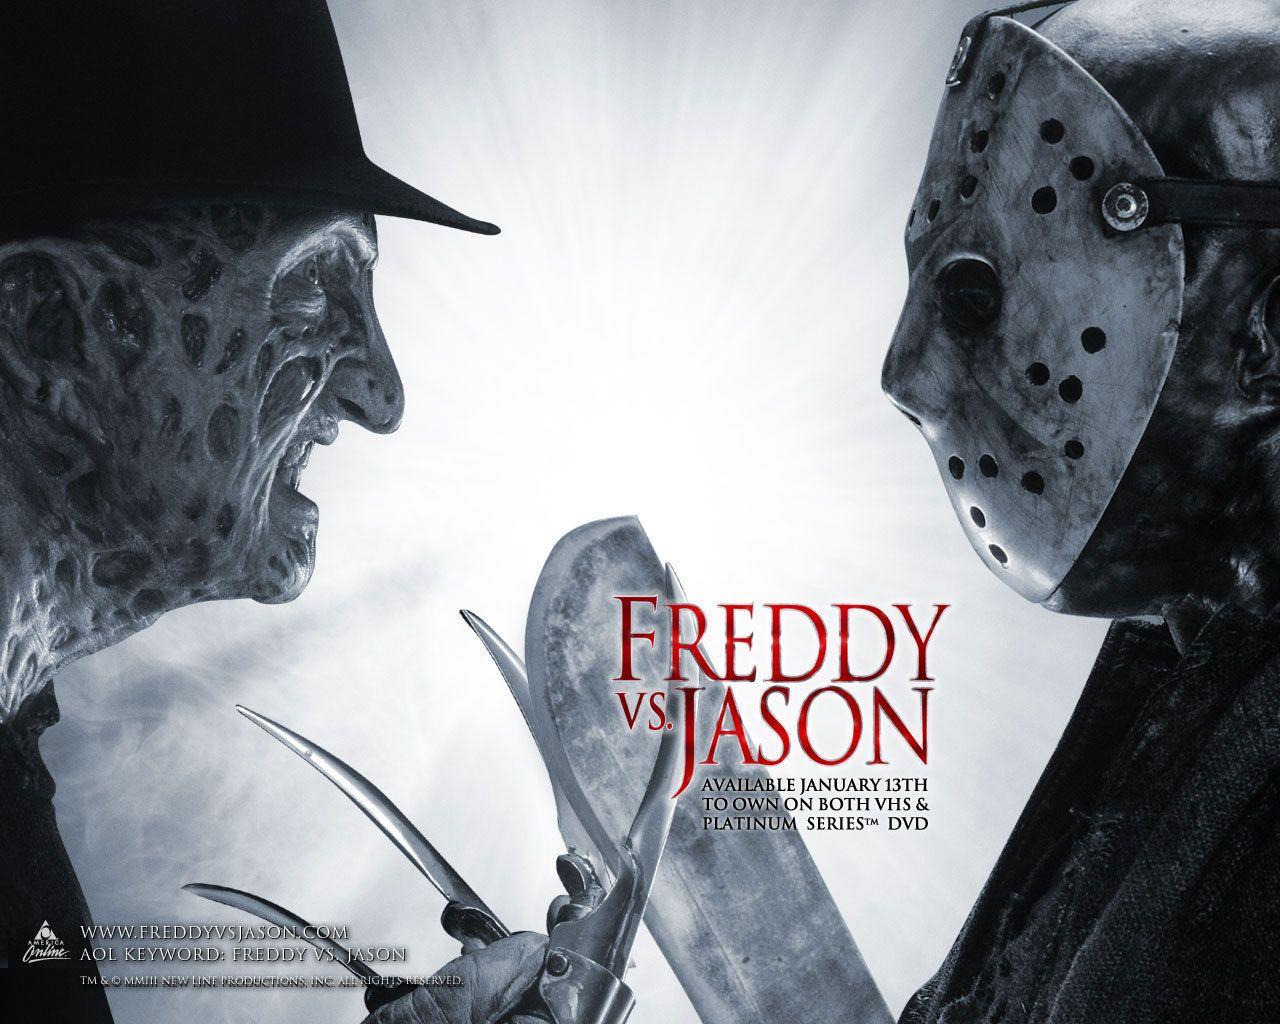 Freddy Vs Jason With Images Freddy Krueger Jason Voorhees